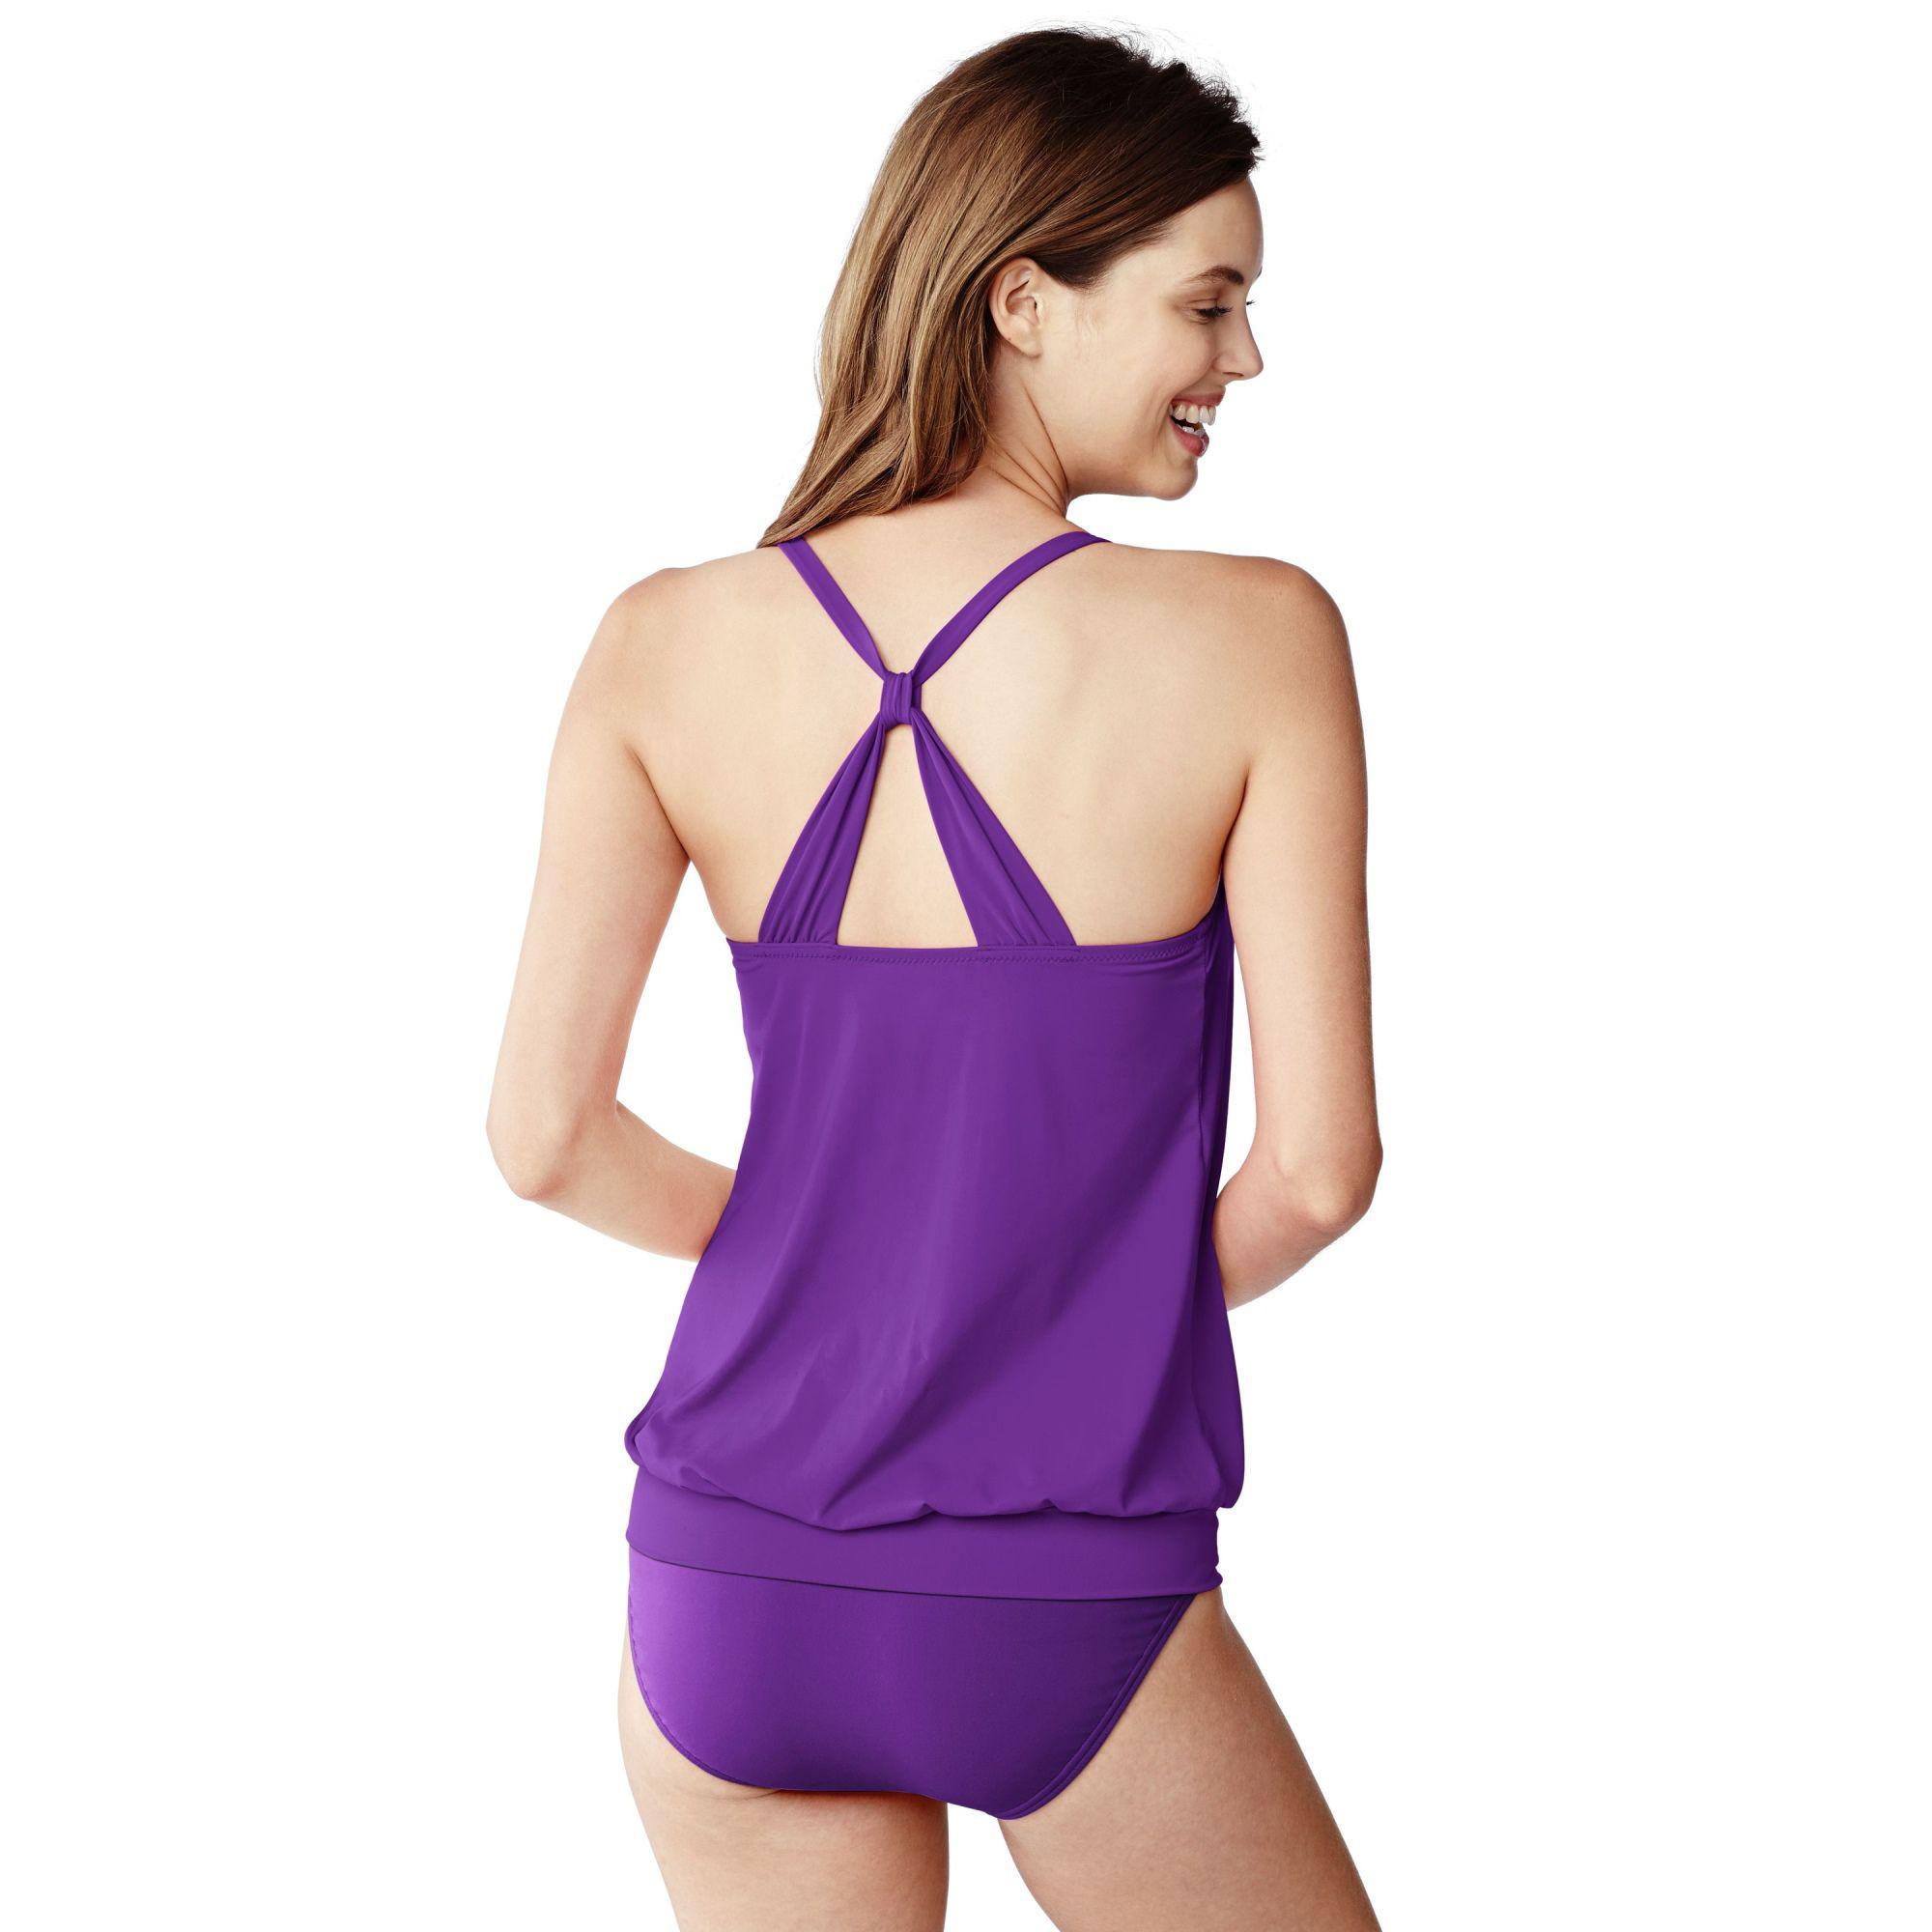 9e0e93b904187 Lands' End Purple Dd-cup Beach Living Blouson Tankini Top in Purple ...